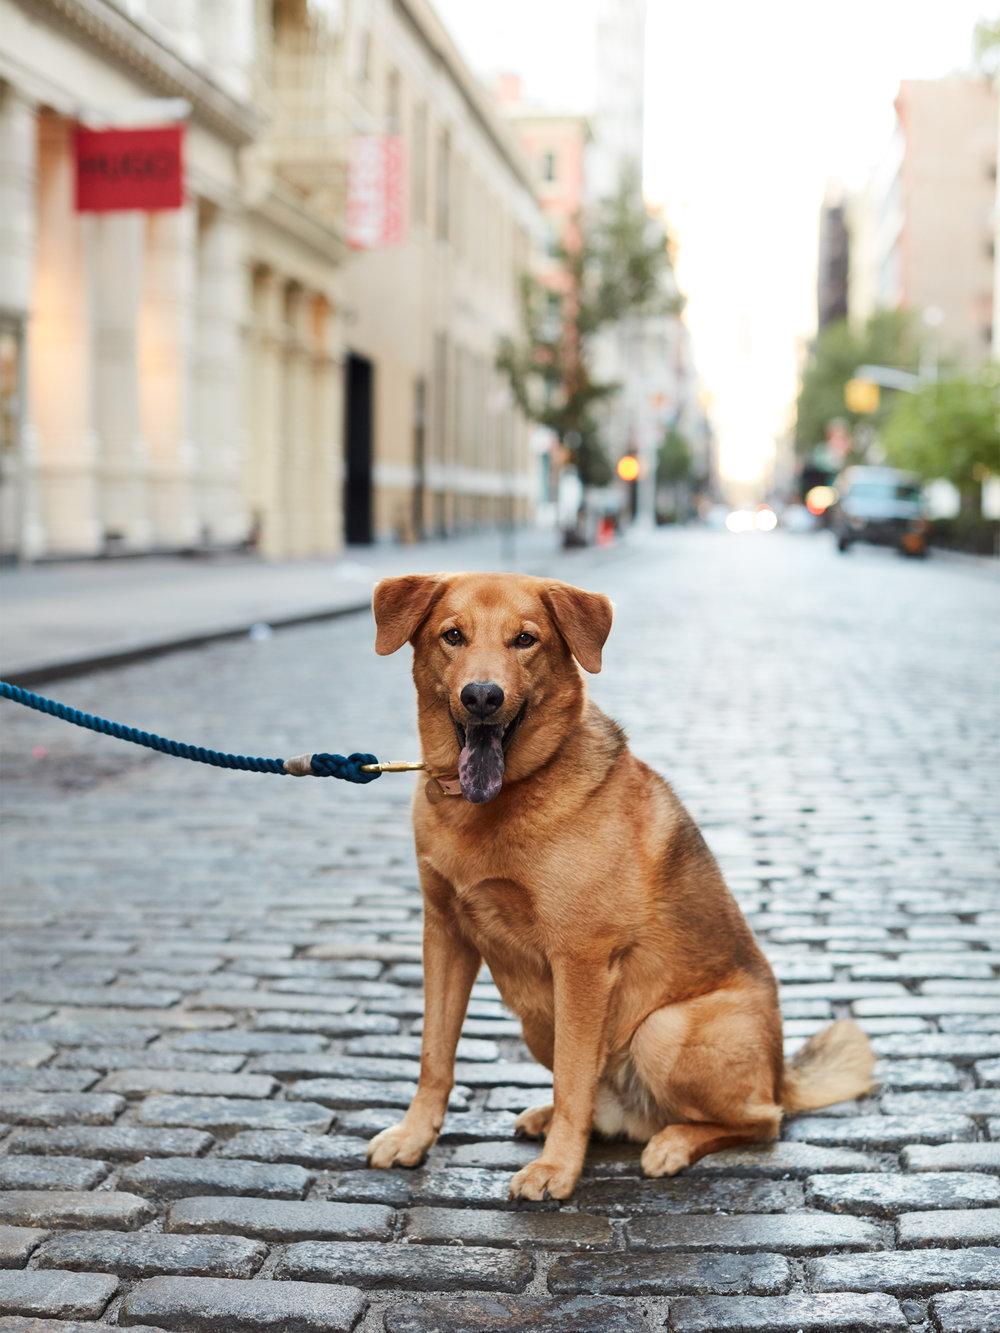 Leo/Best Friends Animal Shelter